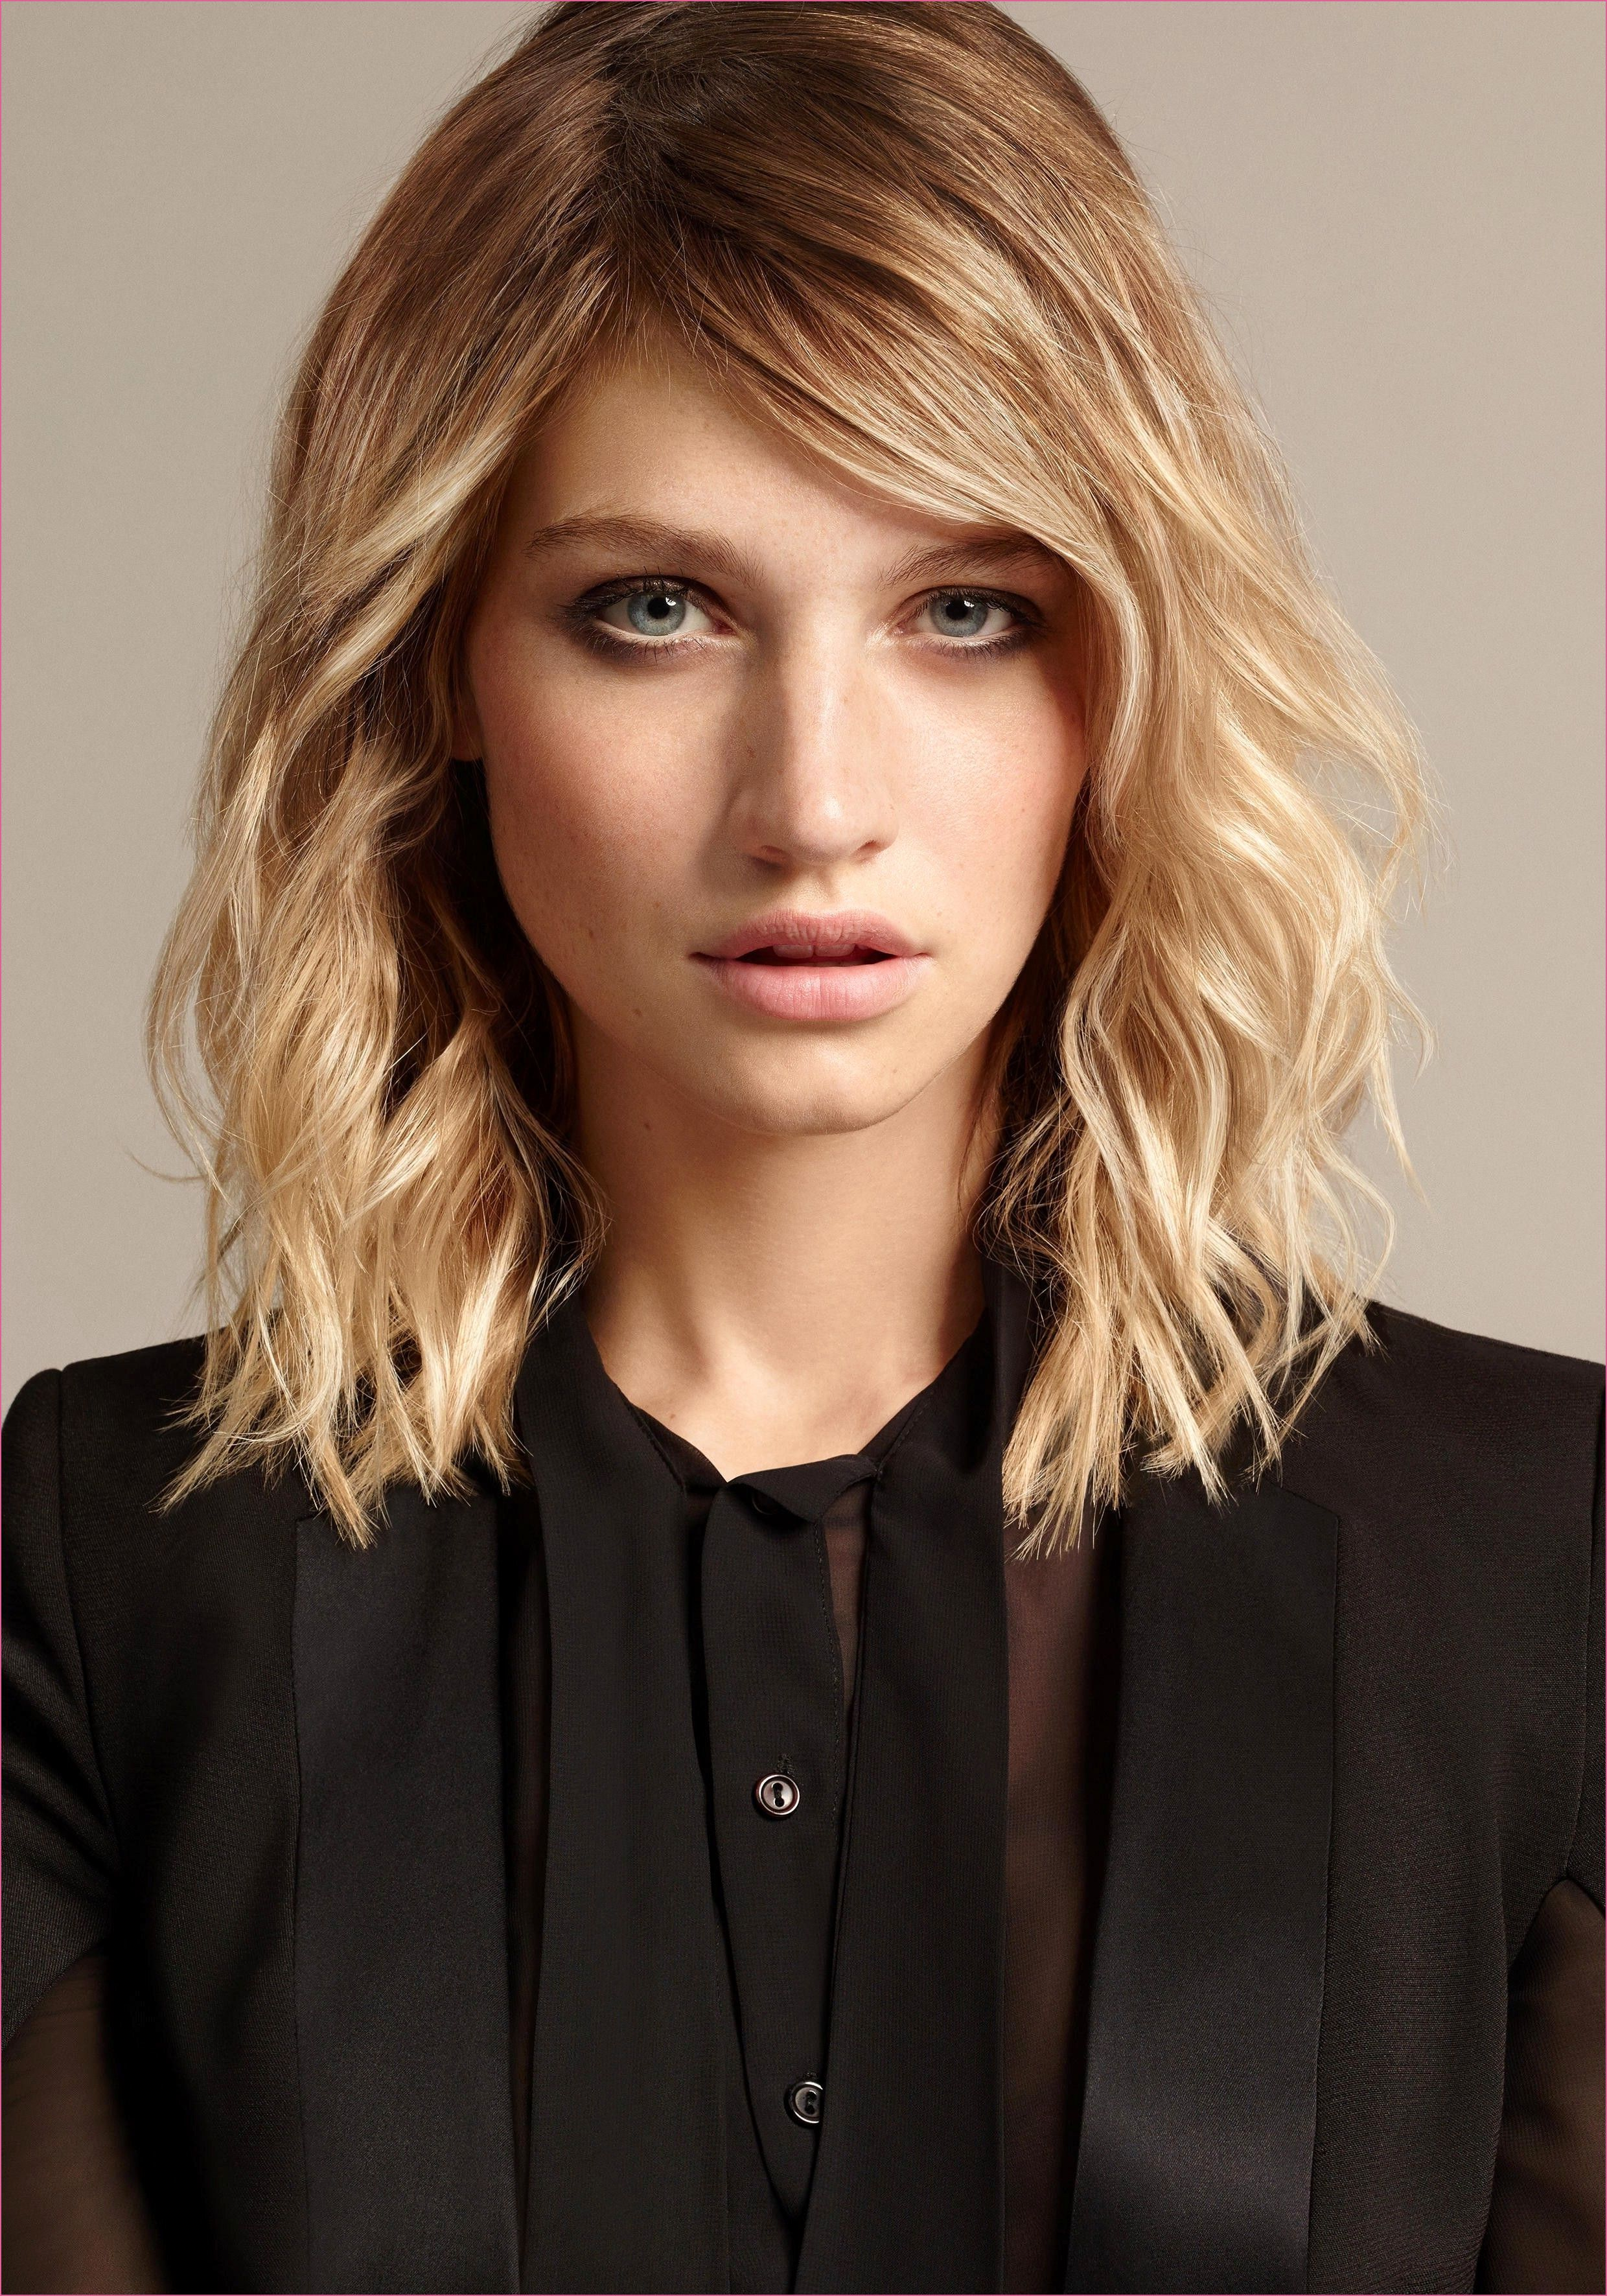 Frisuren Ab 40 Mittellang Medium Hair Styles Haircuts For Long Hair Womens Hairstyles